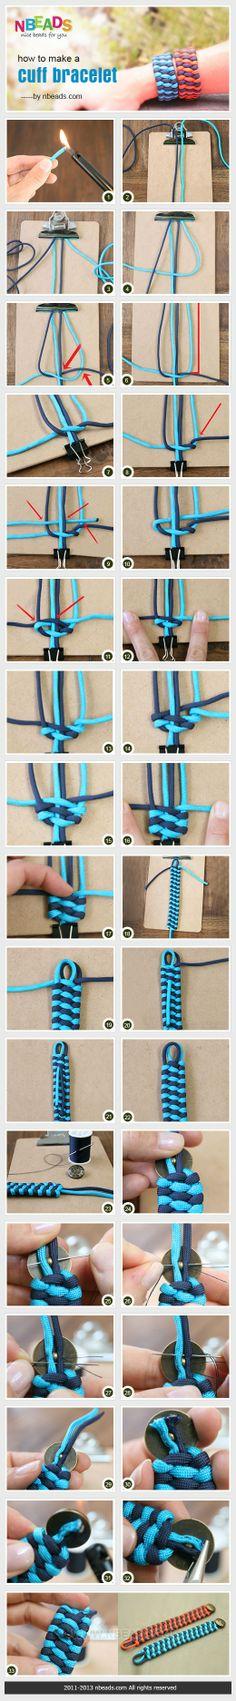 How to Make A Cuff Bracelet – Nbeads